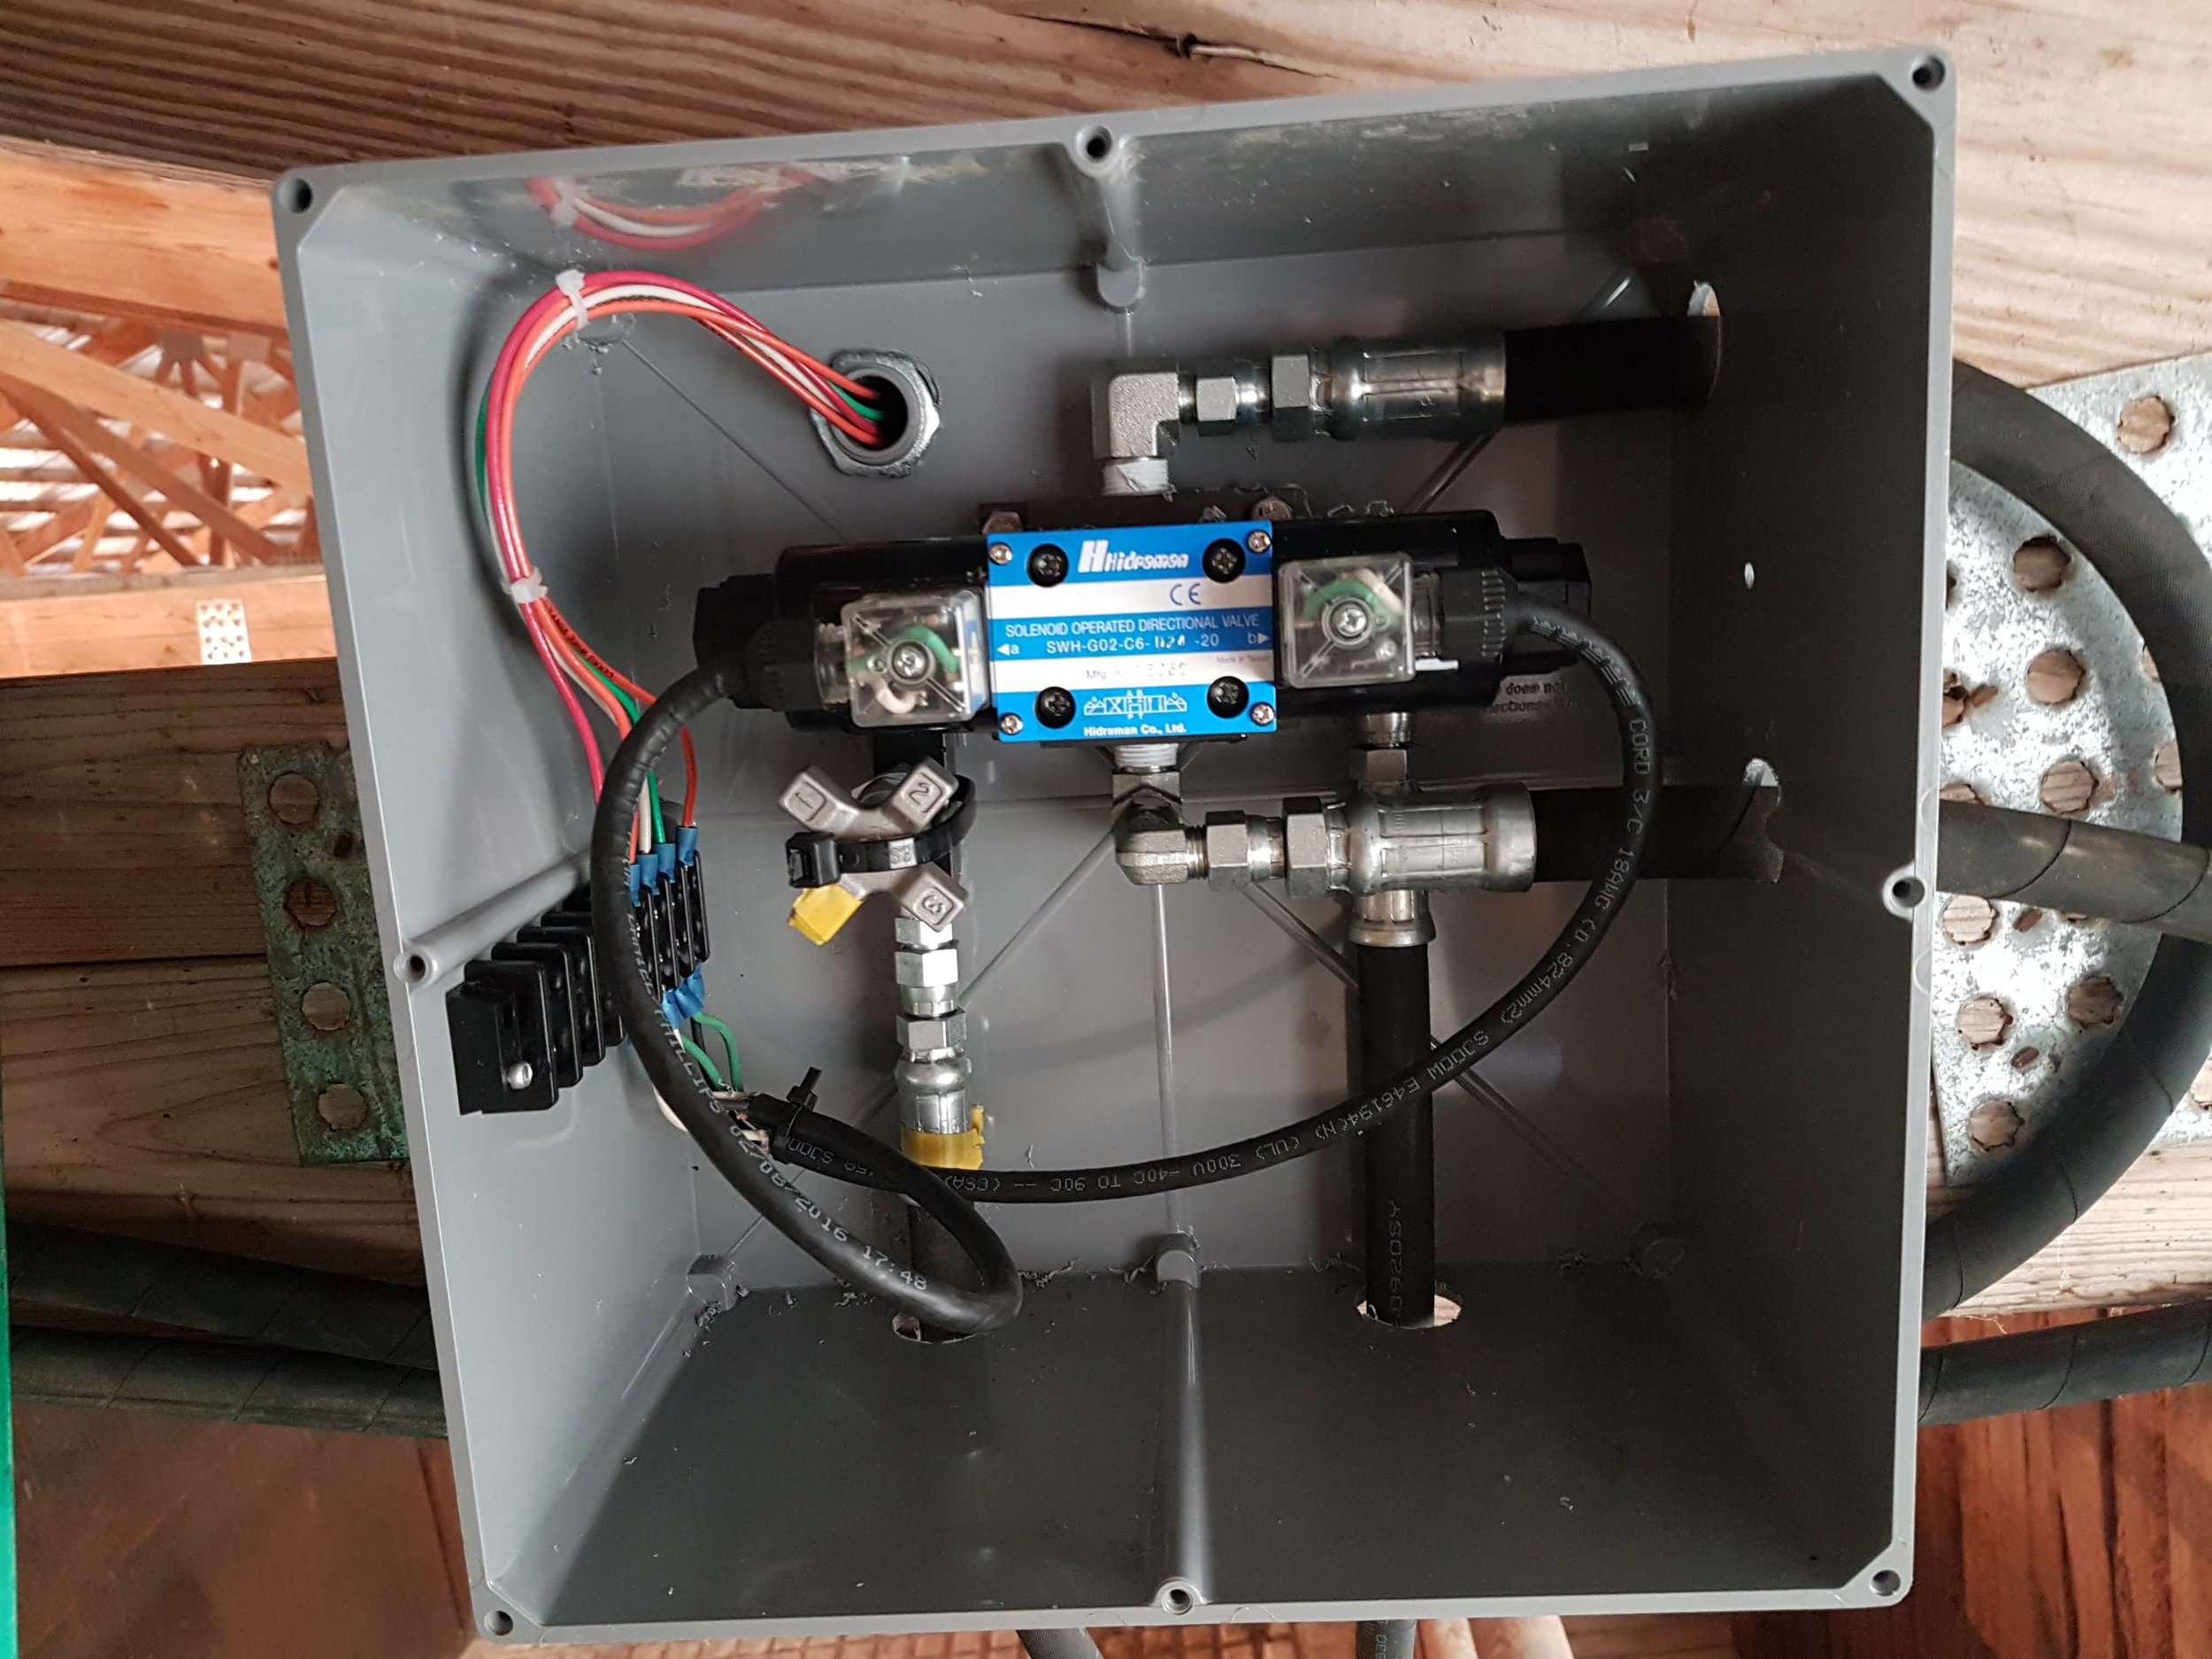 Electric valve inside a 12 x 12 PVC box.